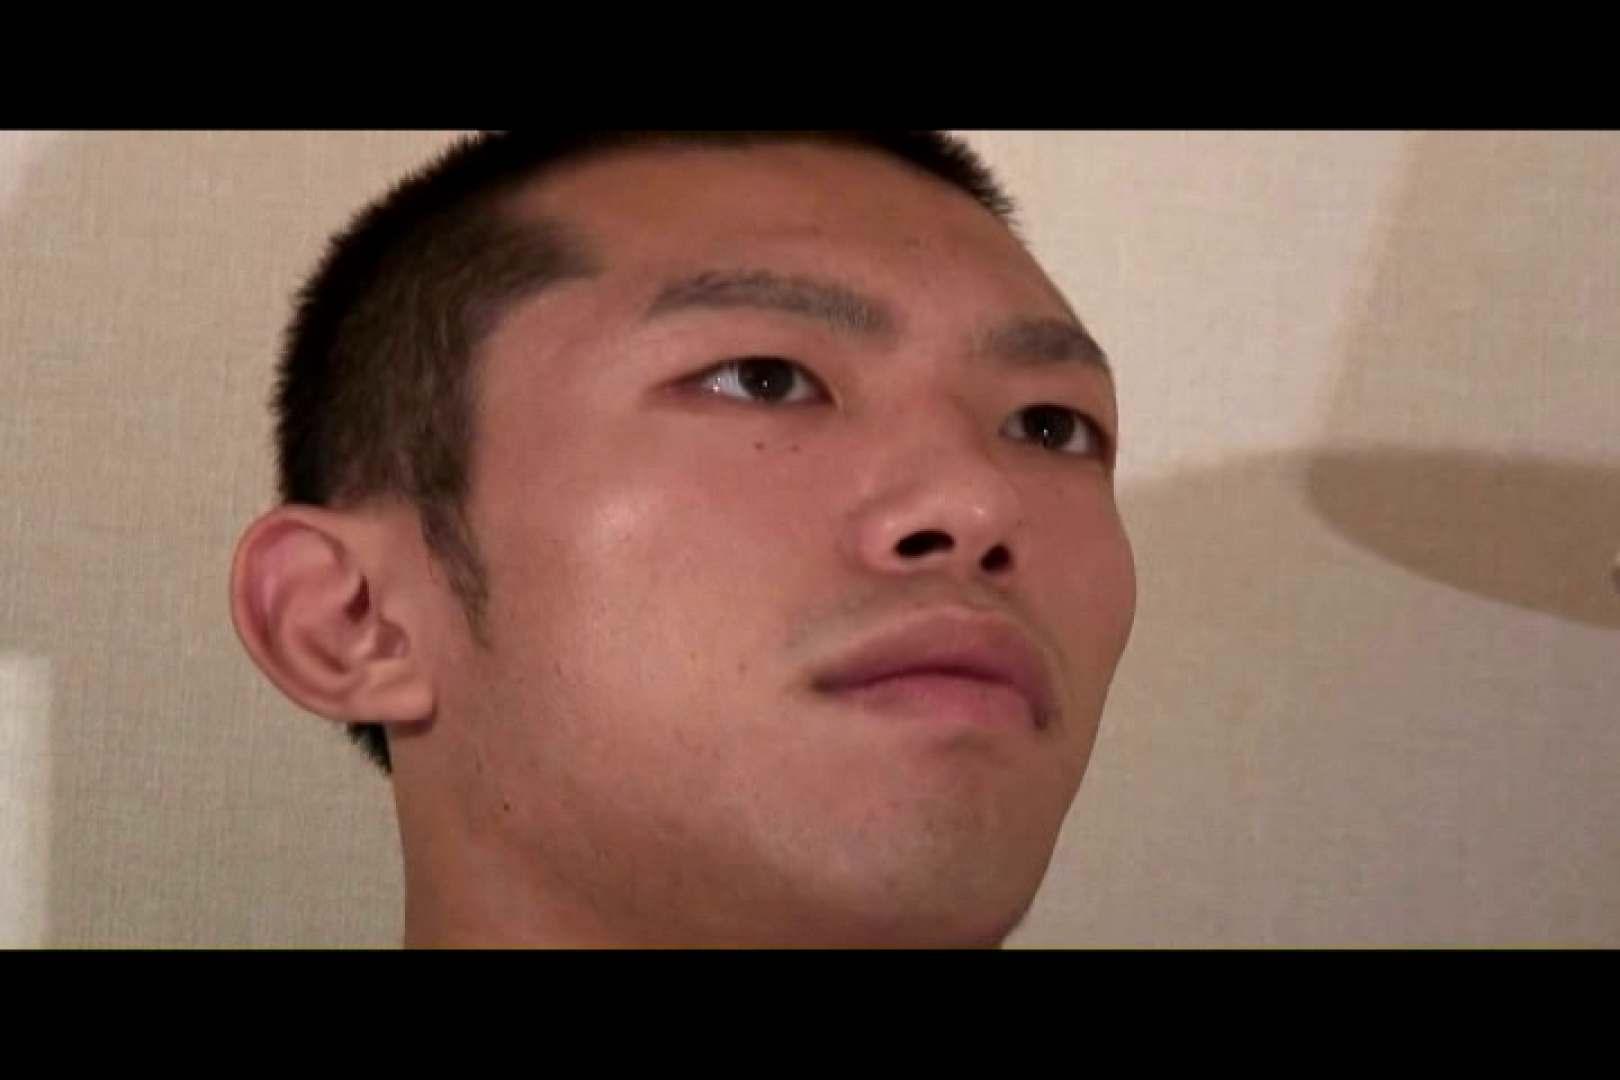 Bistro「イケメン」~Mokkori和風仕立て~vol.04 オナニー アダルトビデオ画像キャプチャ 91枚 55